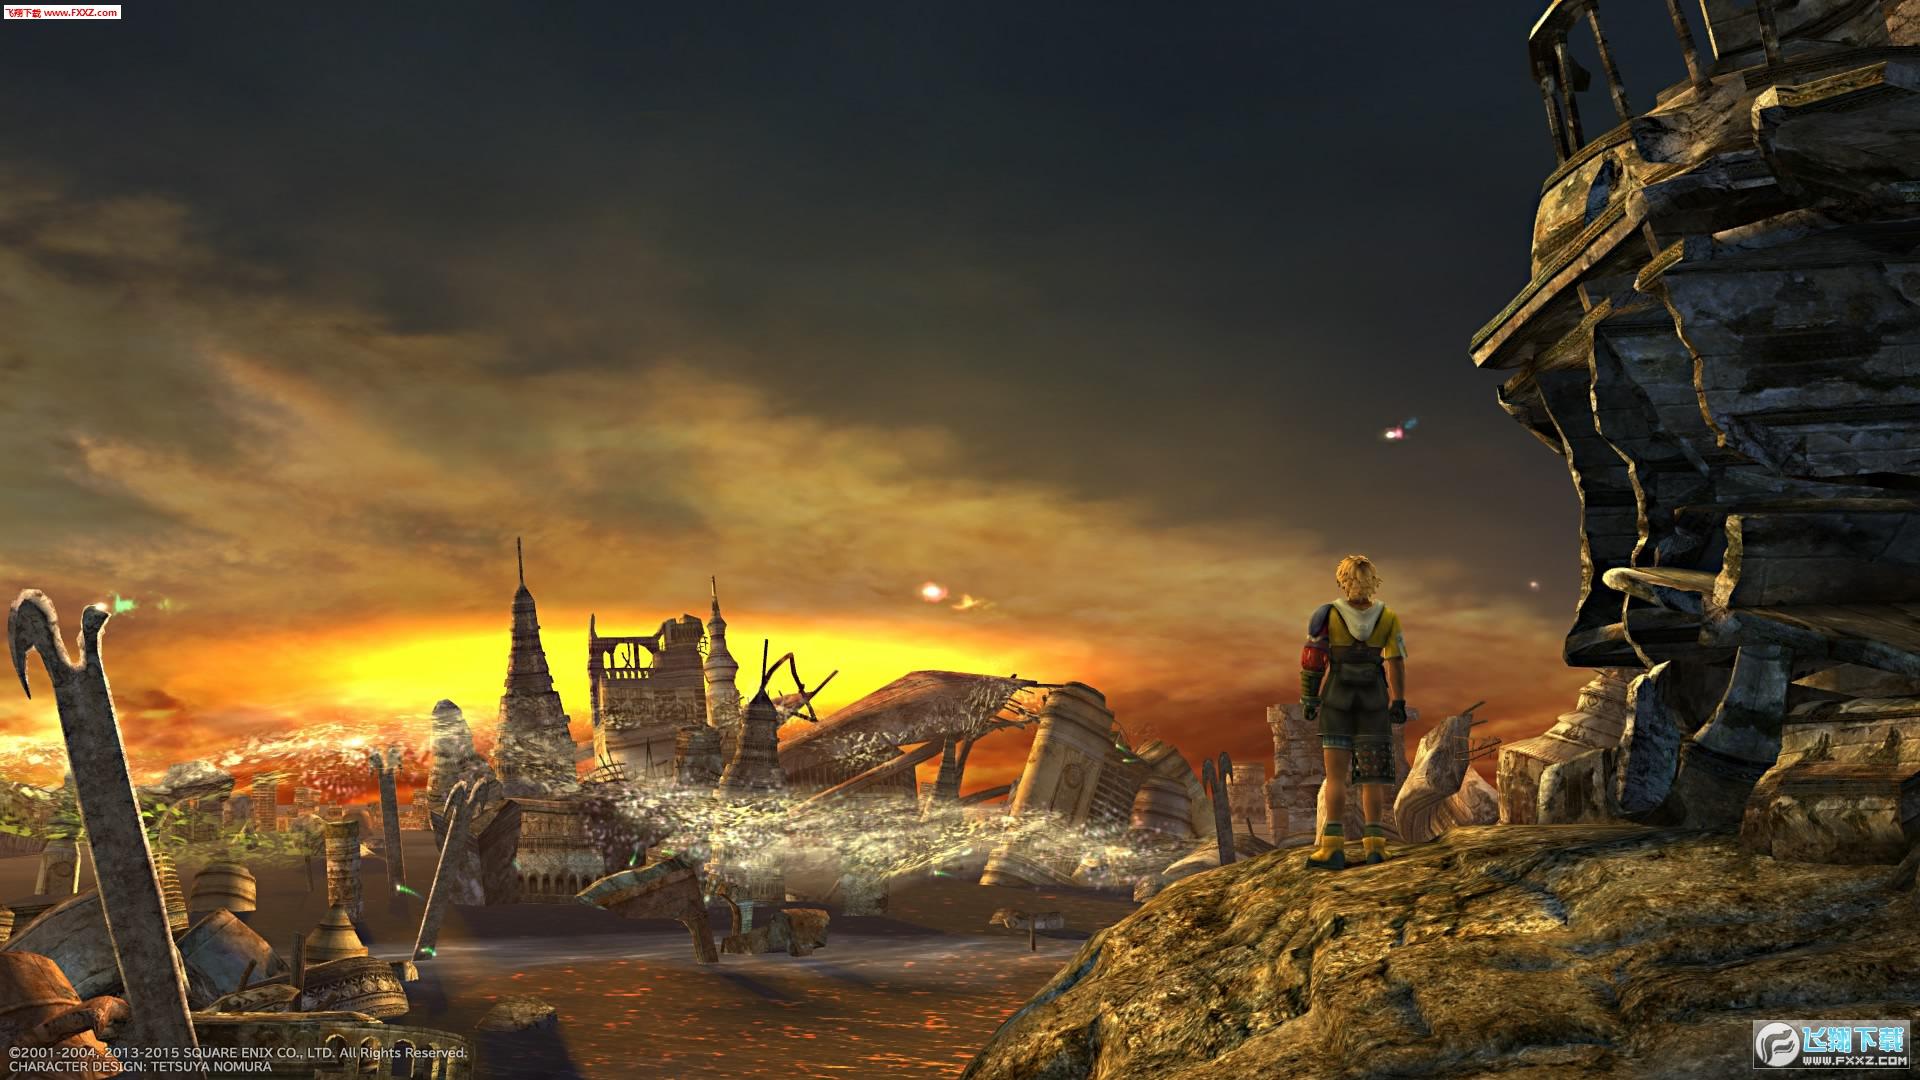 最终幻想10/10-2高清重制版(FINAL FANTASY X/X-2 HD Remaster)截图2